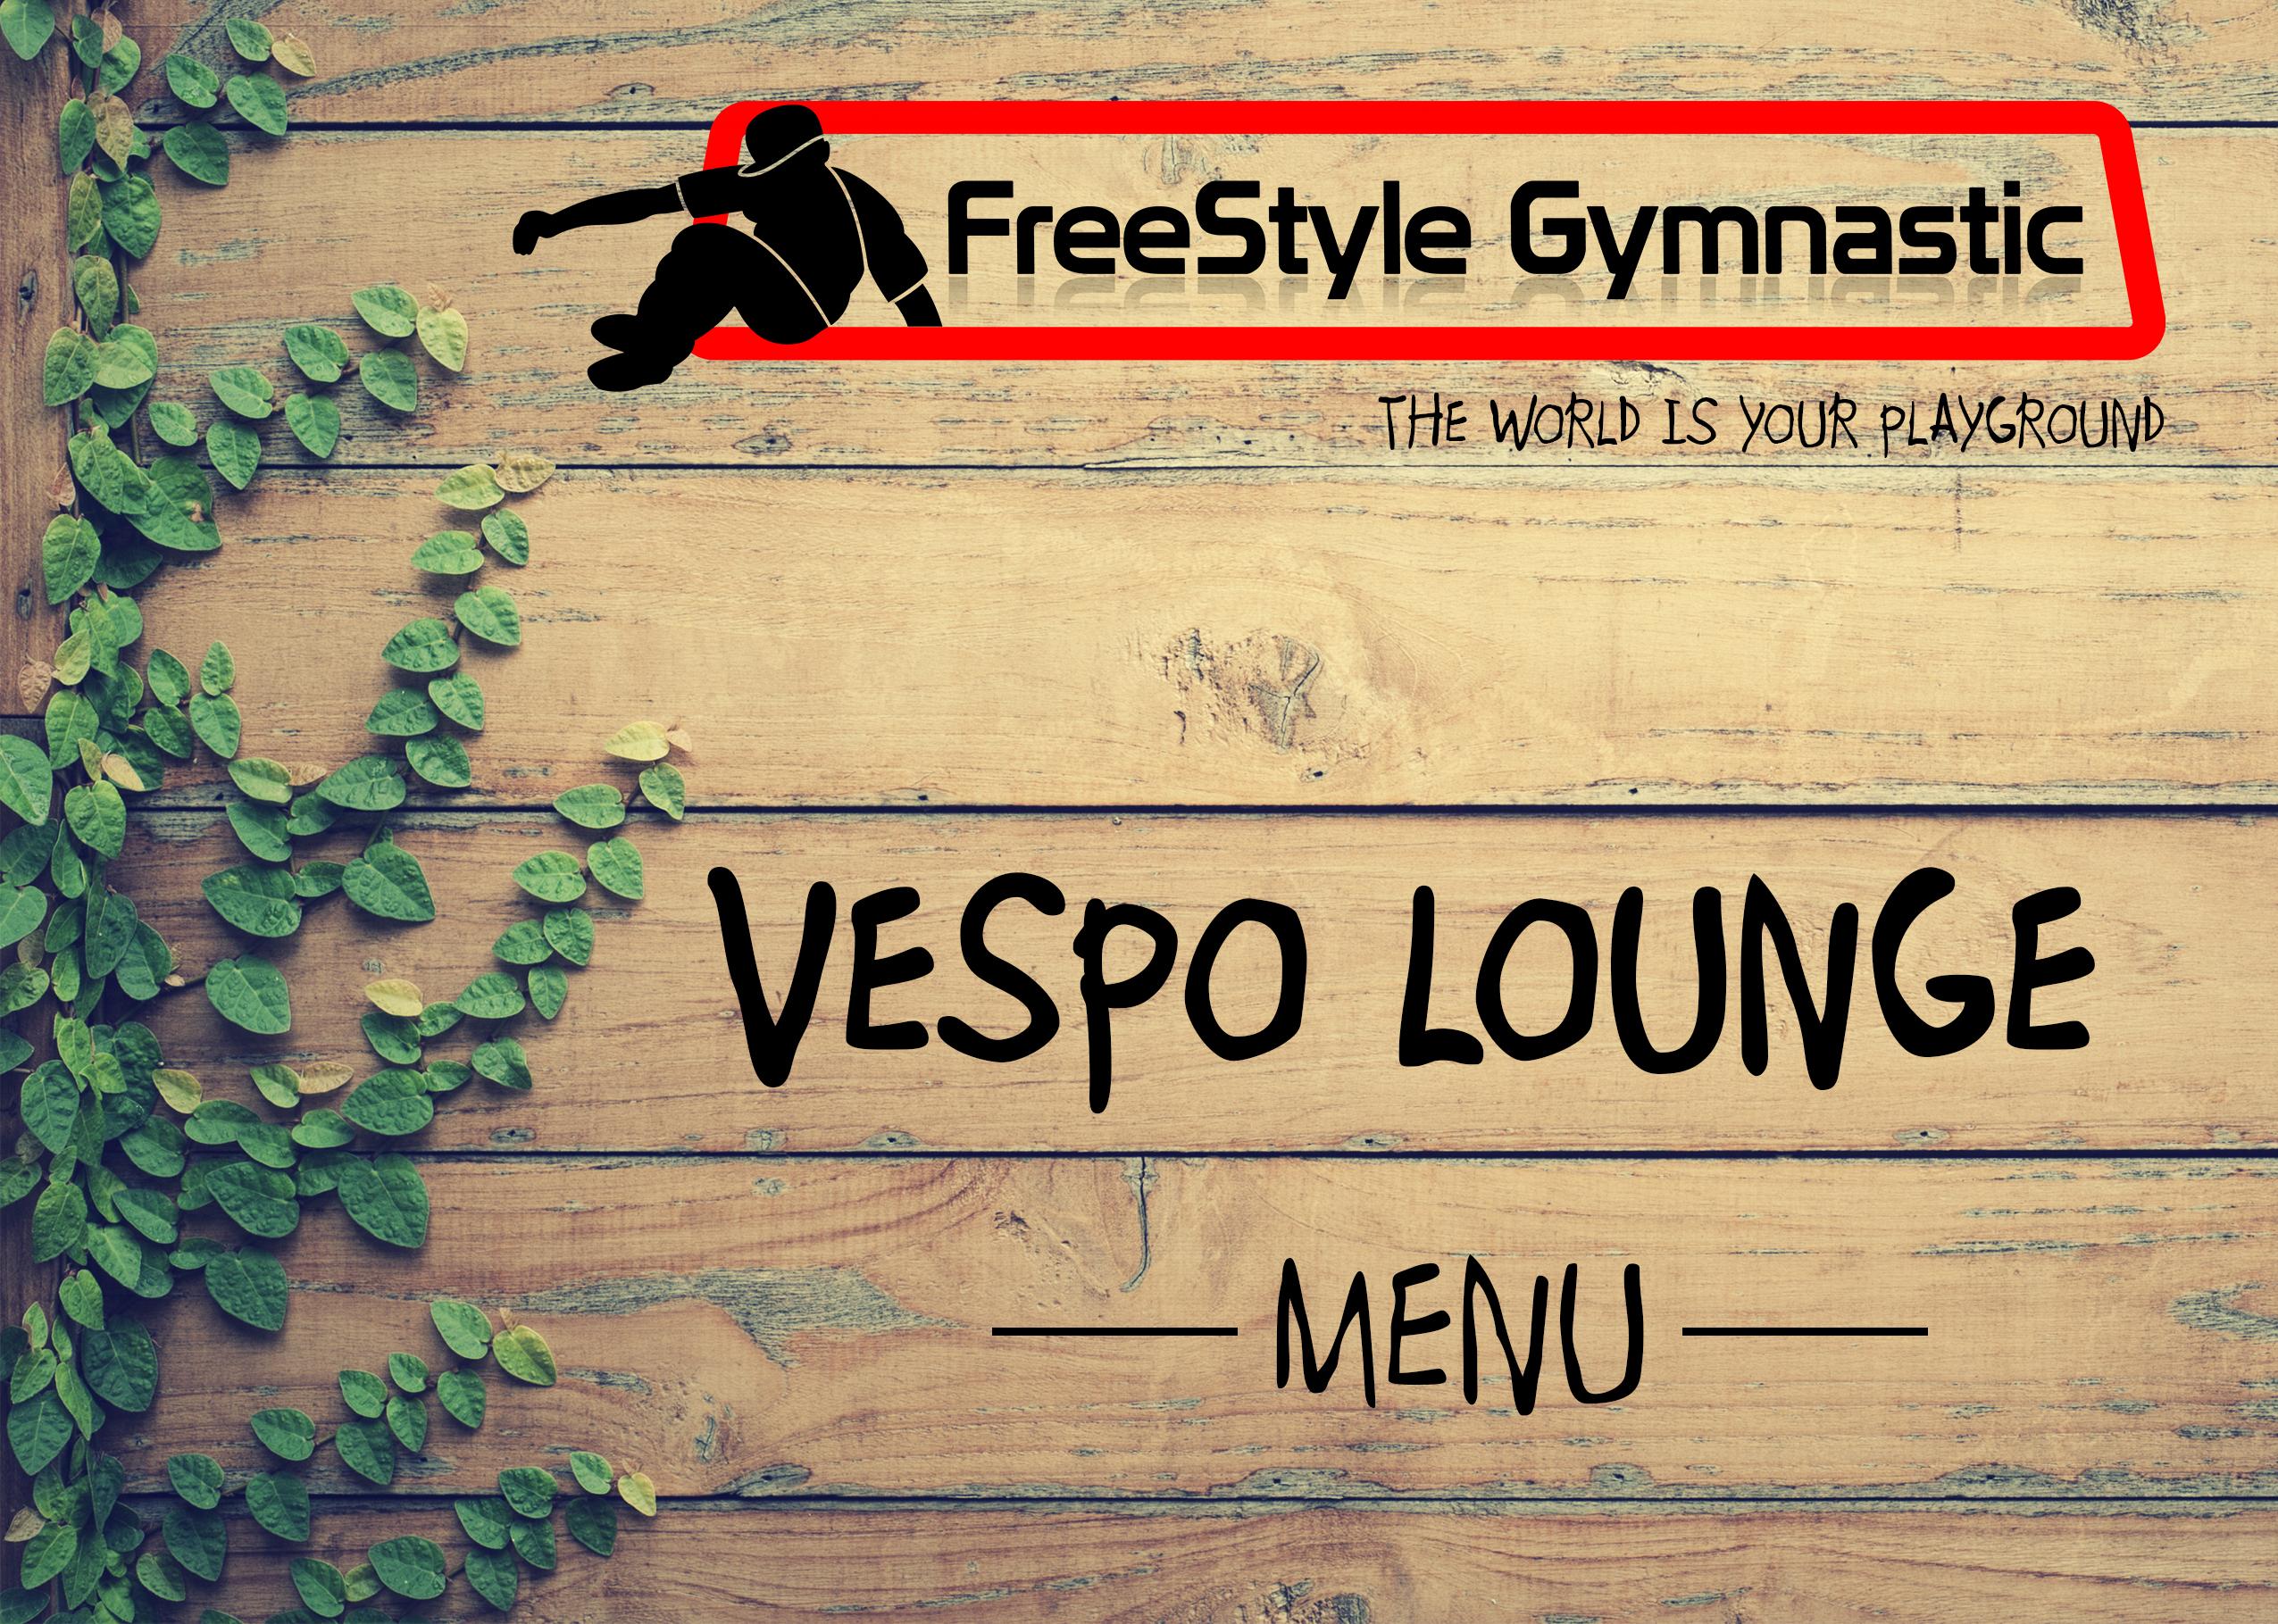 Vespo Lounge